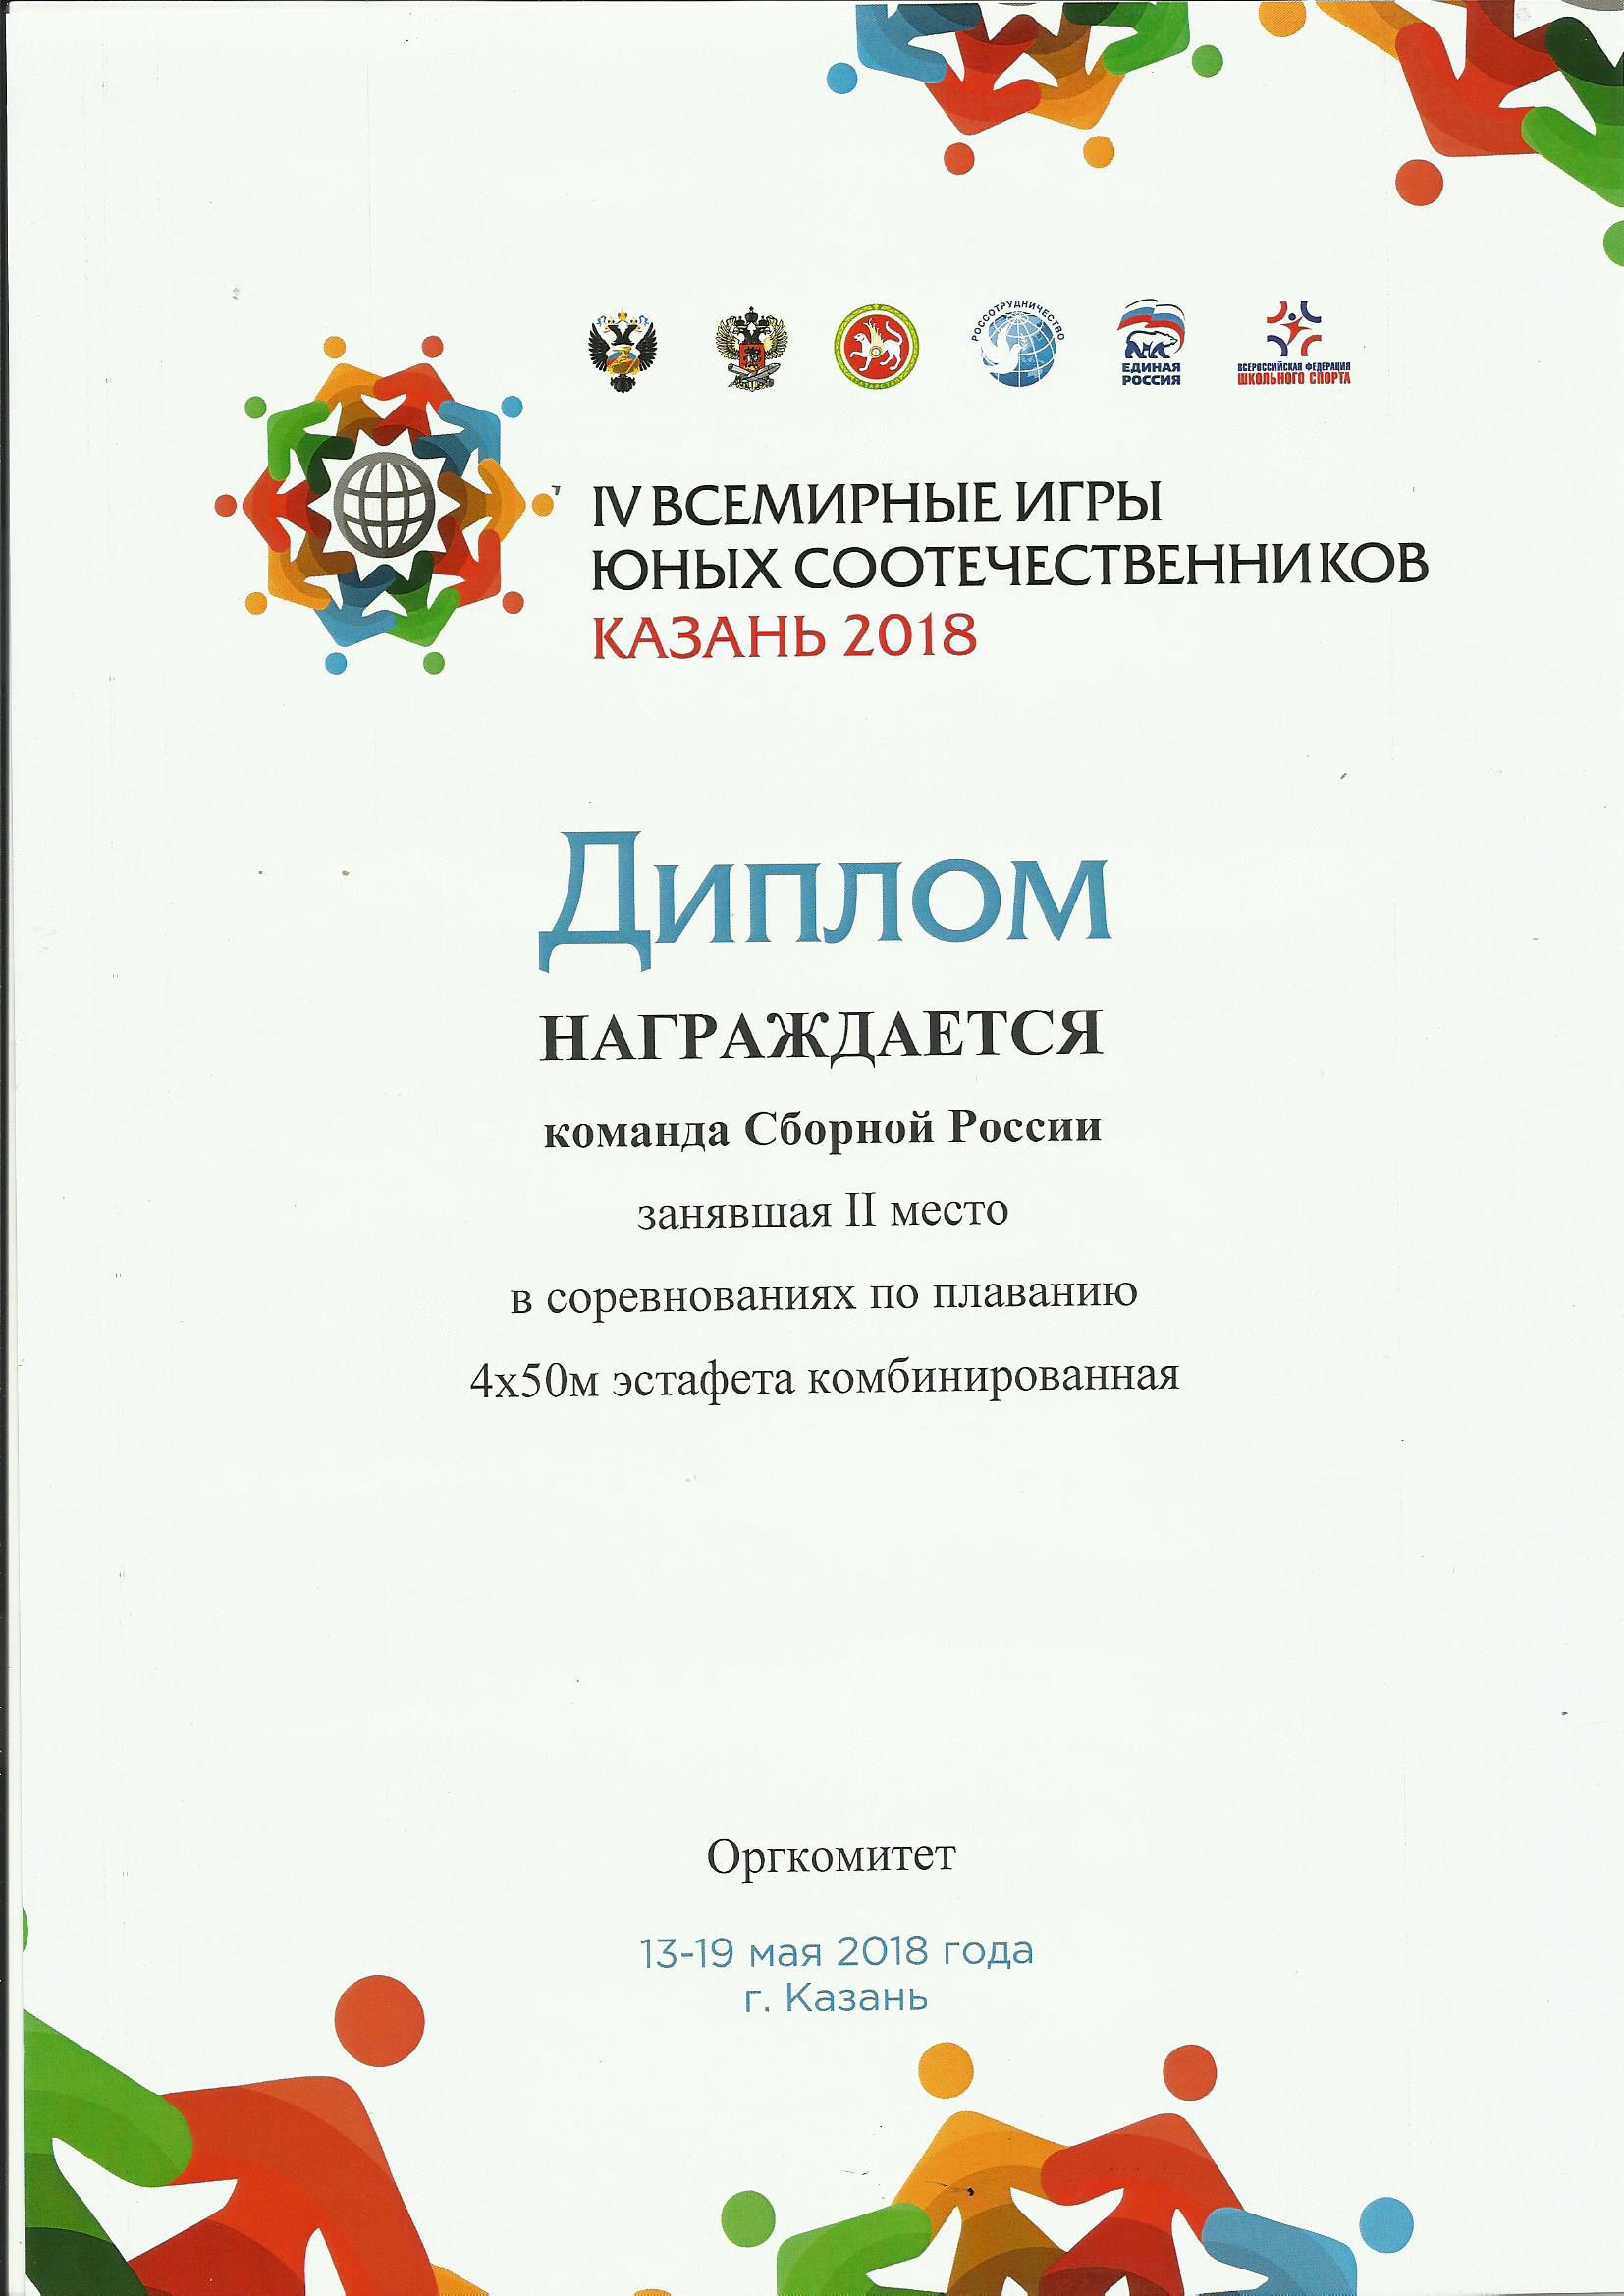 https://dlpp.ru/wp-content/uploads/2019/11/диплом-4-1.jpg